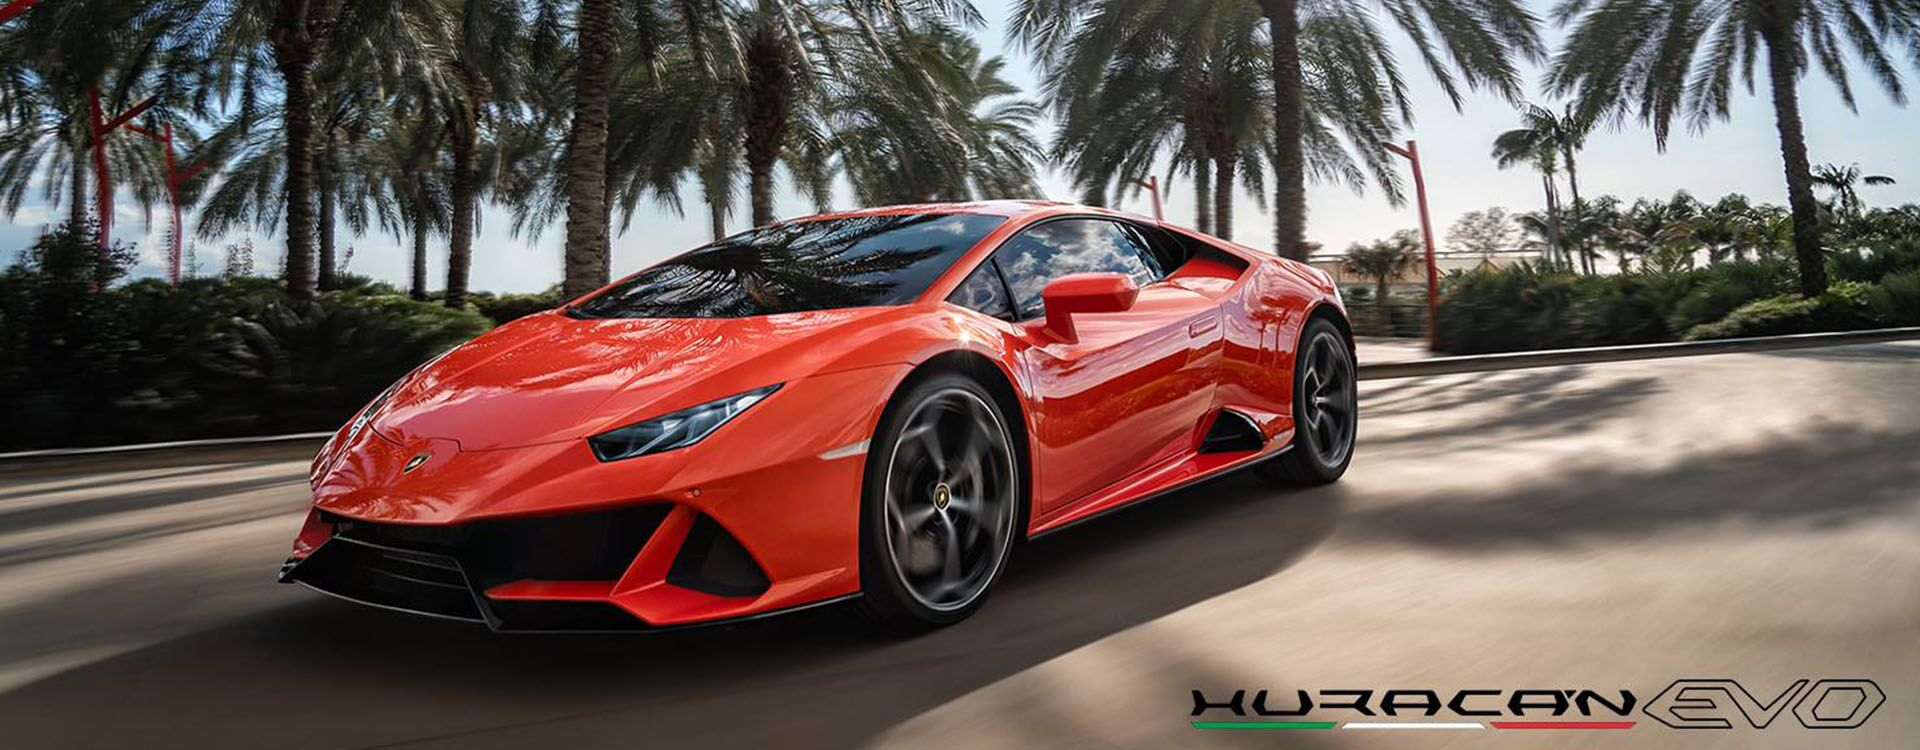 Lamborghini Dealership Palm Beach Fl Used Cars Lamborghini Palm Beach